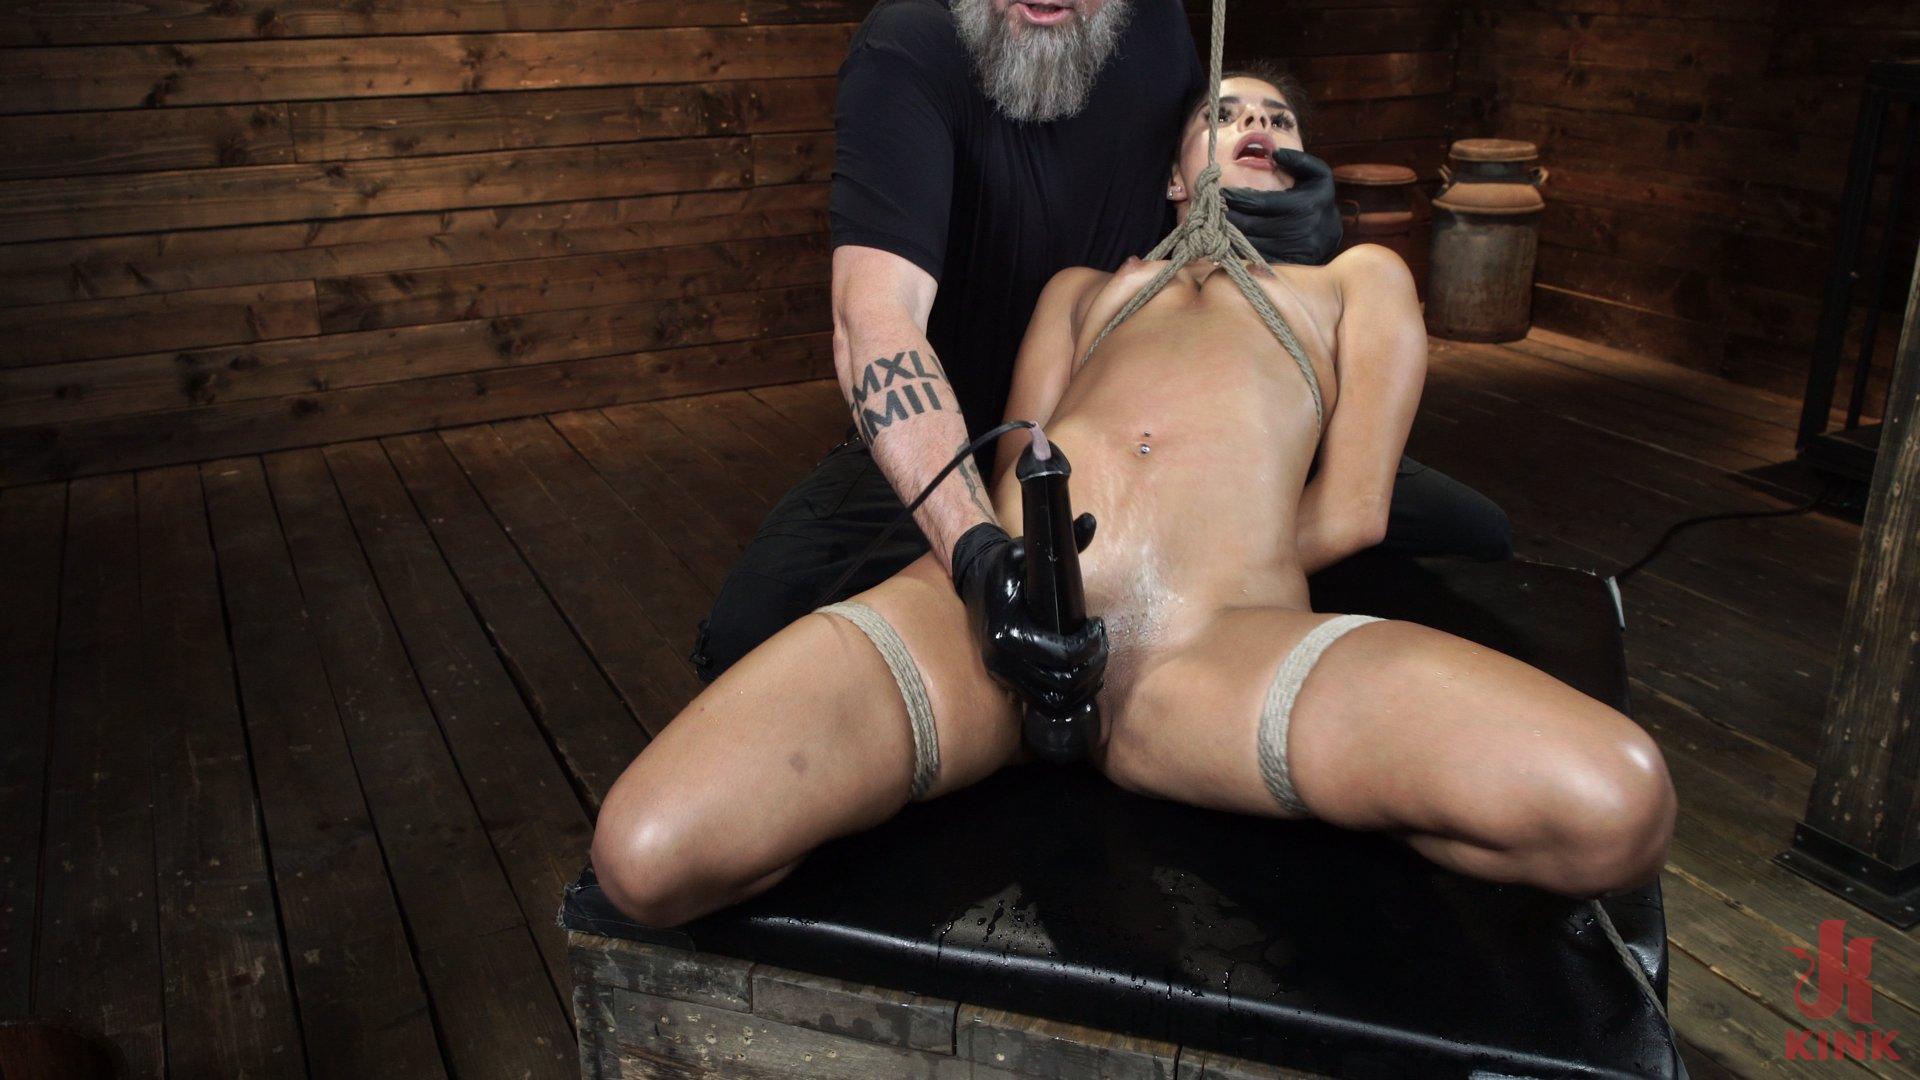 Photo number 14 from Katya Rodriguez: Hogtied Newcomer Bound and Tormented in Bondage shot for Hogtied on Kink.com. Featuring Katya Rodriguez in hardcore BDSM & Fetish porn.